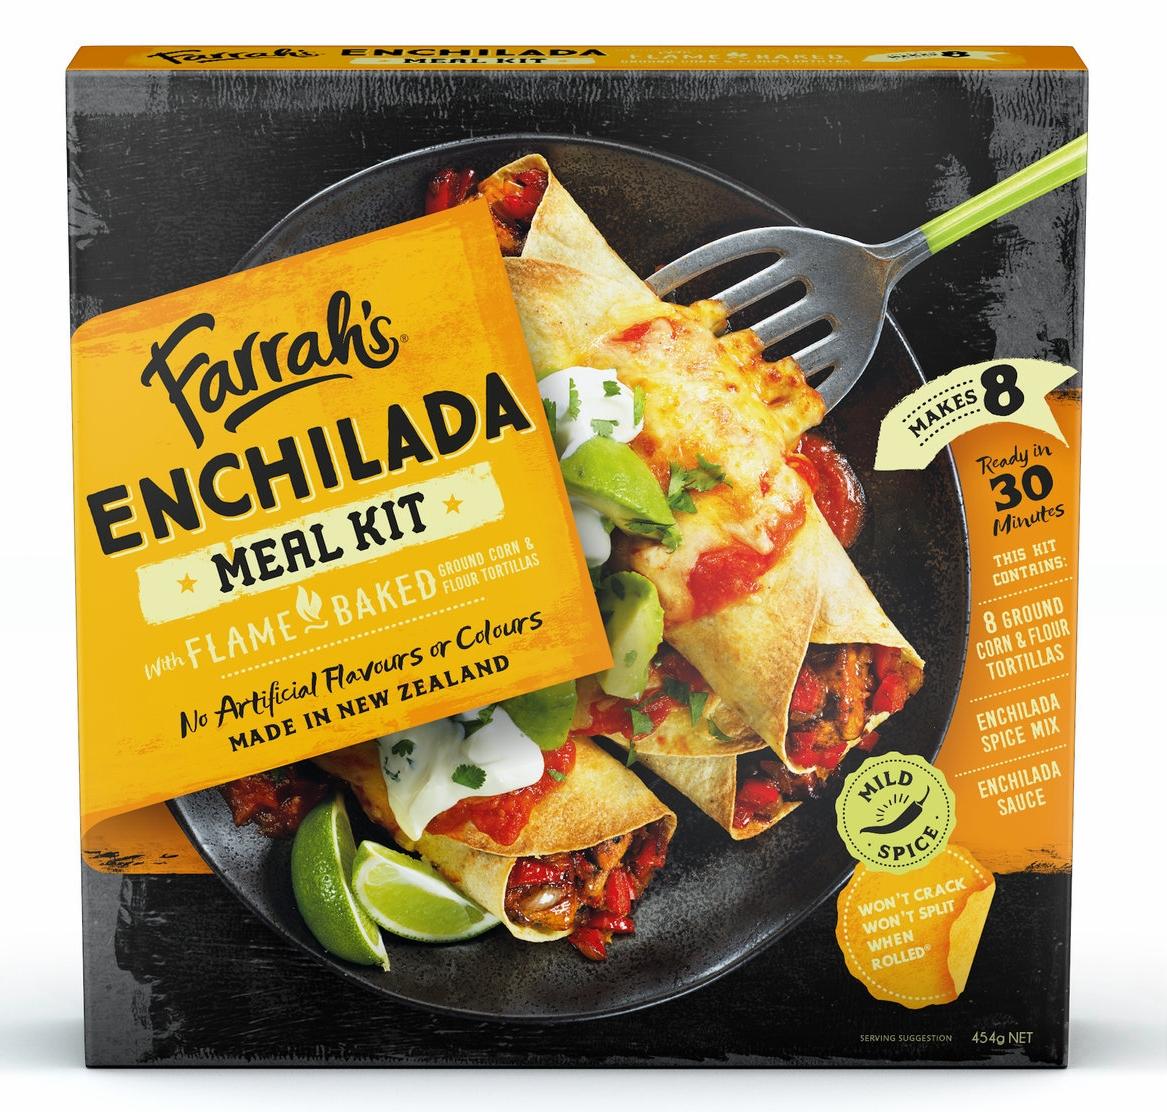 Enchilada Render v1a.jpg